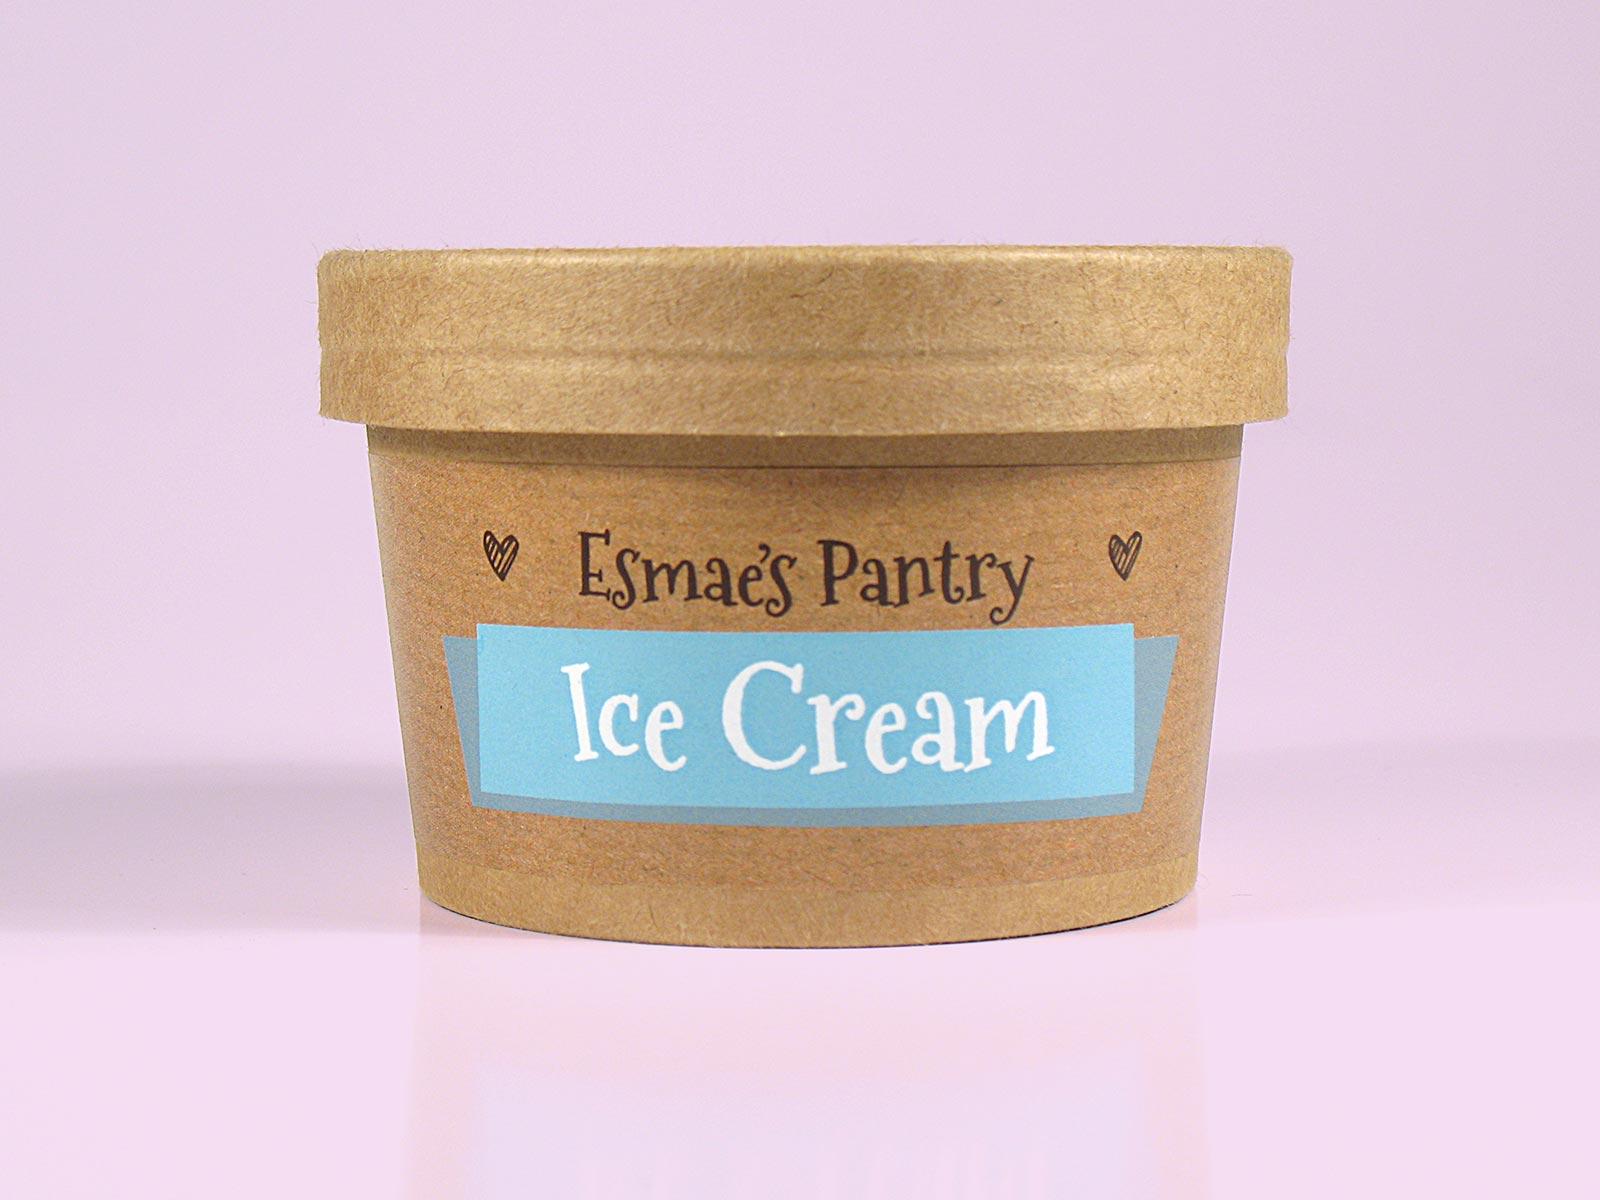 Esmae's Pantry Packaging Design Dog Ice Cream